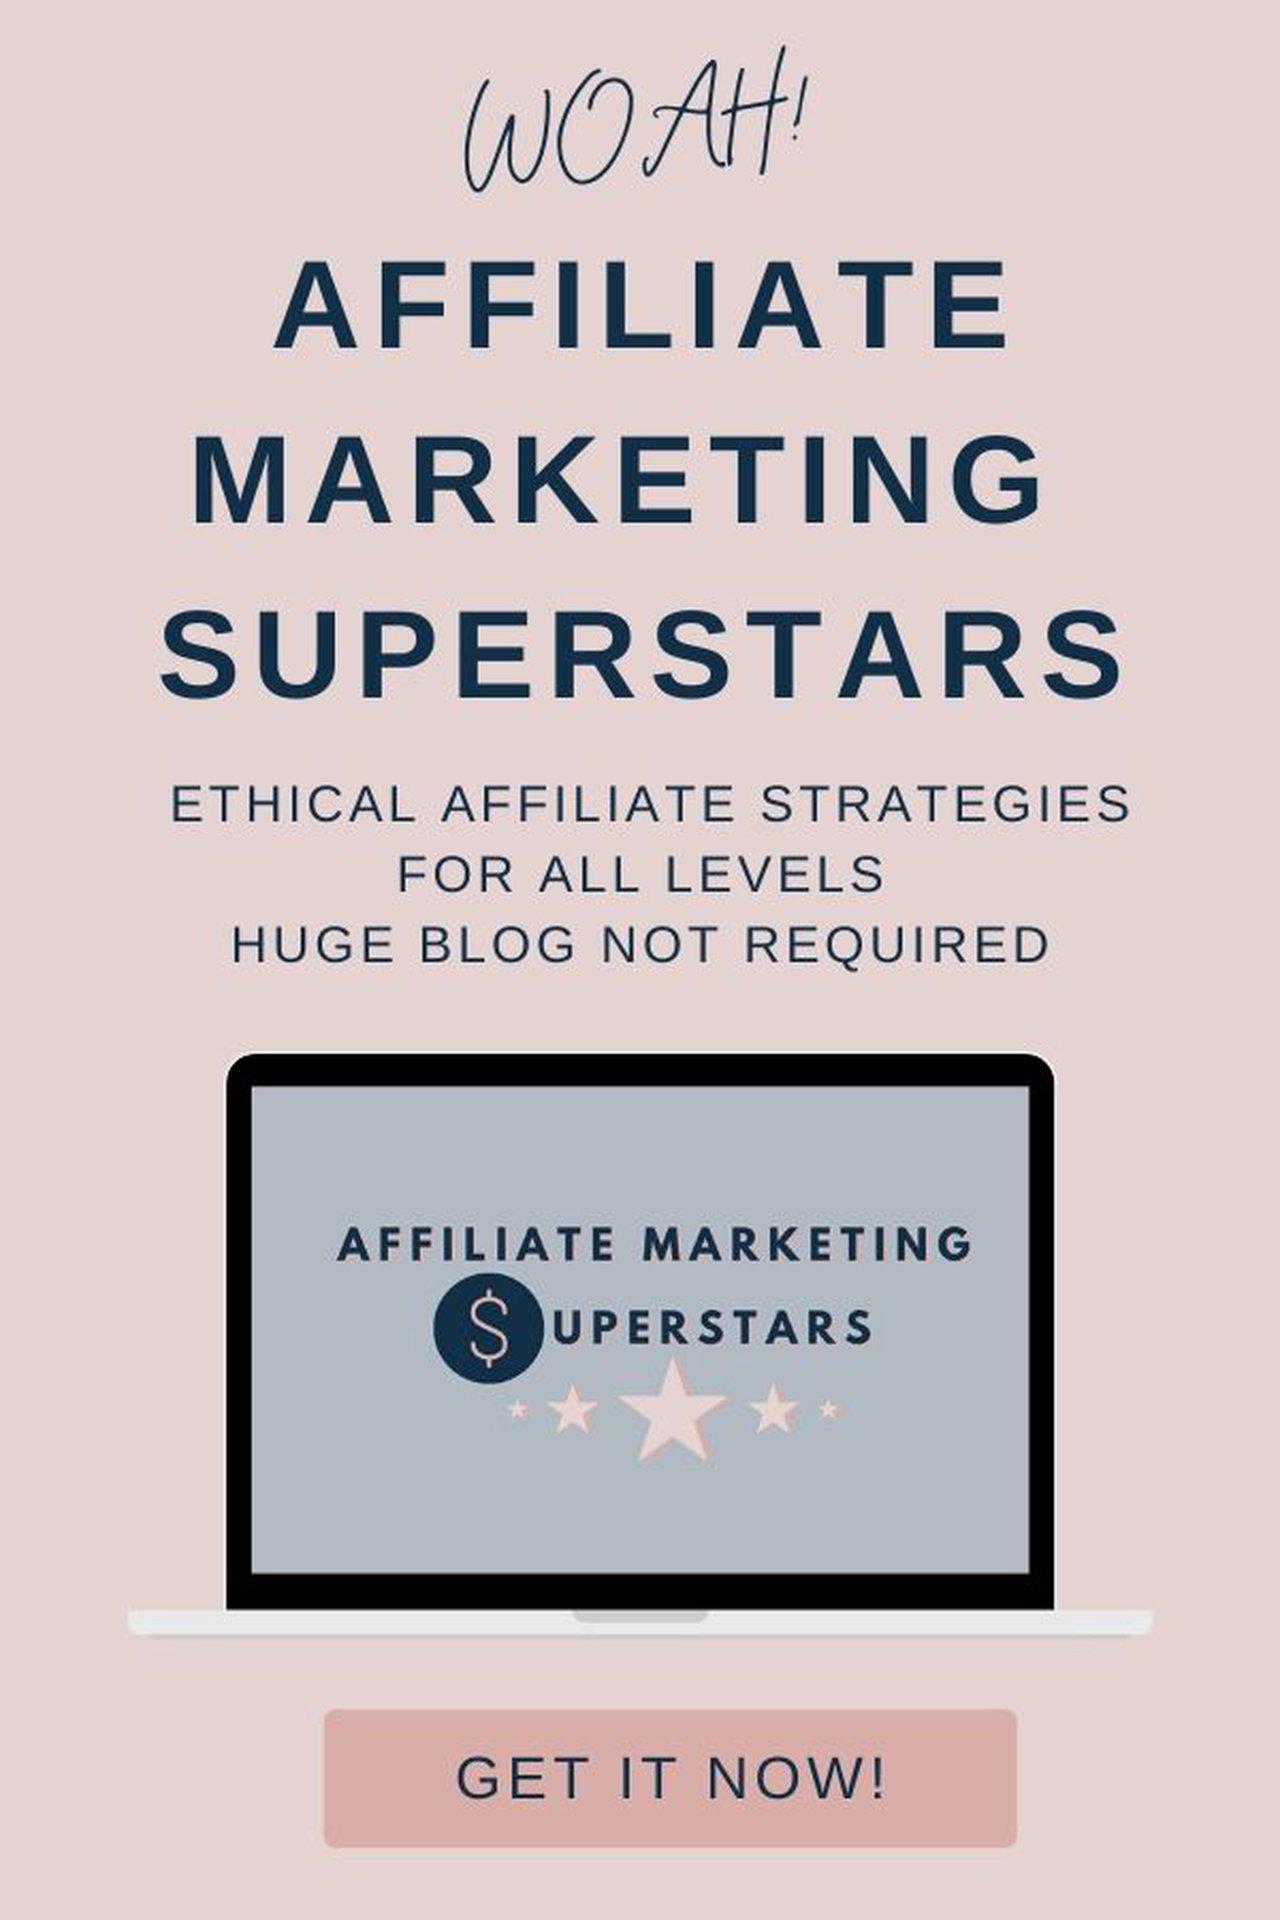 Affiliate Marketing Superstars Course